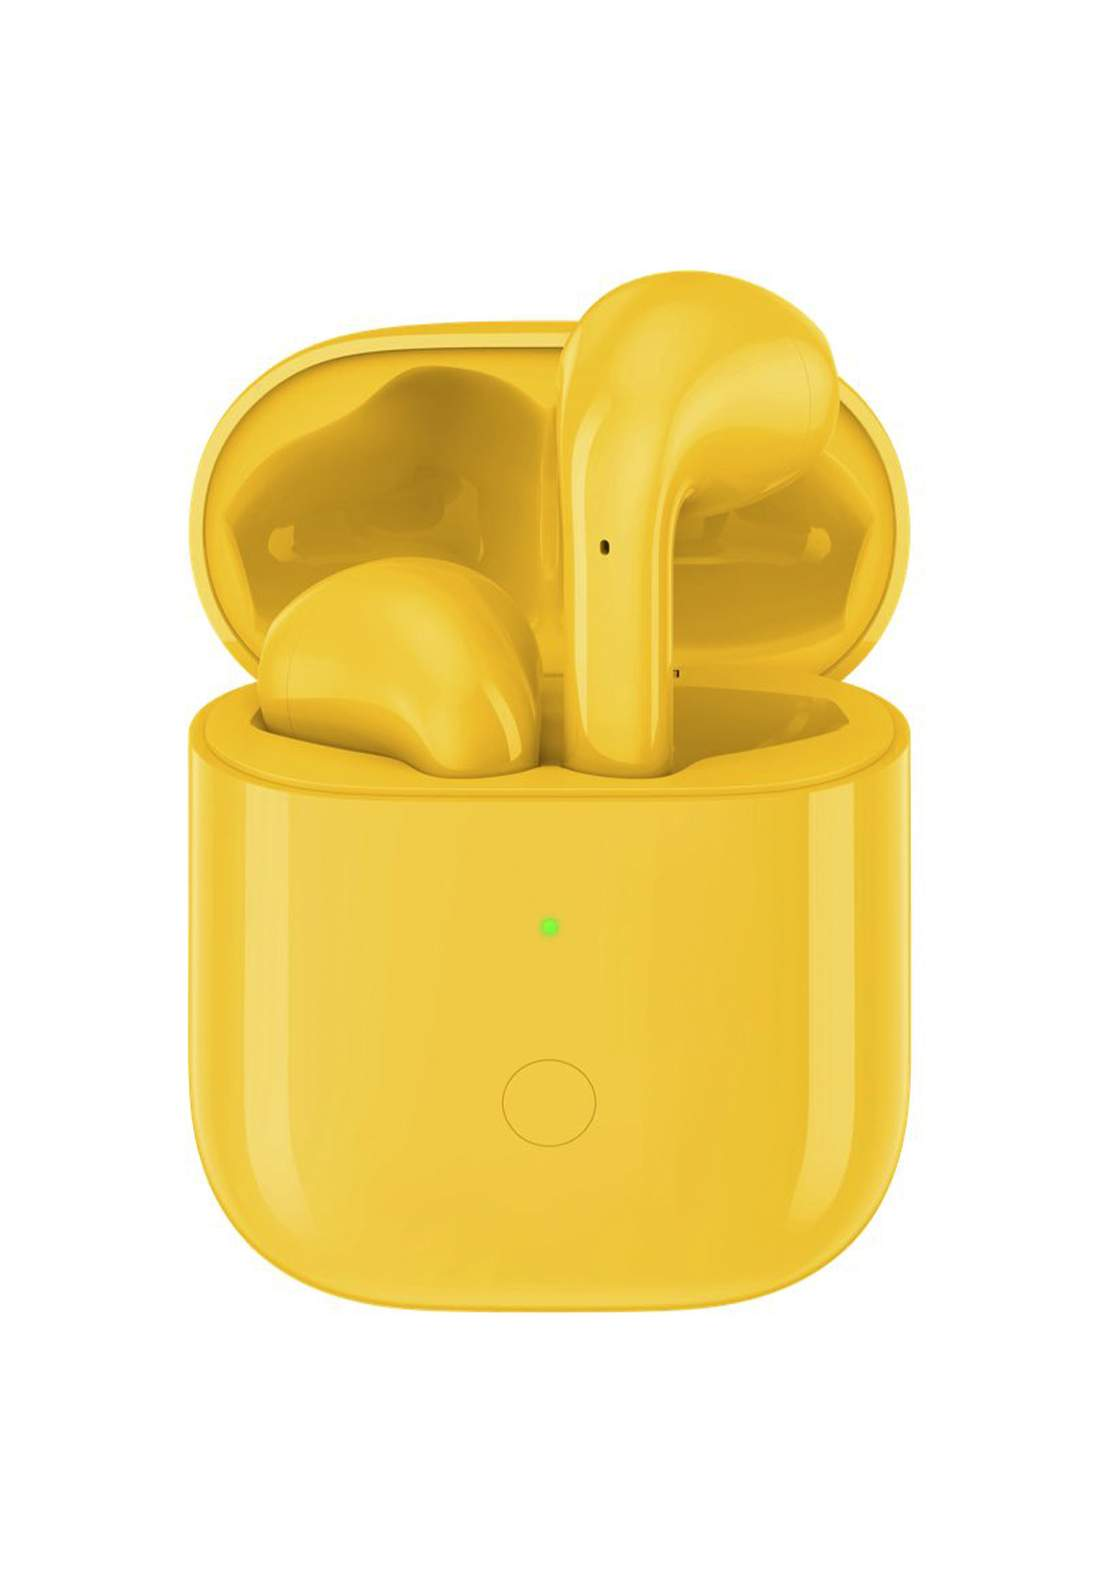 Realme Buds Air True Wireless  Earphones - Yellow سماعة لا سلكية